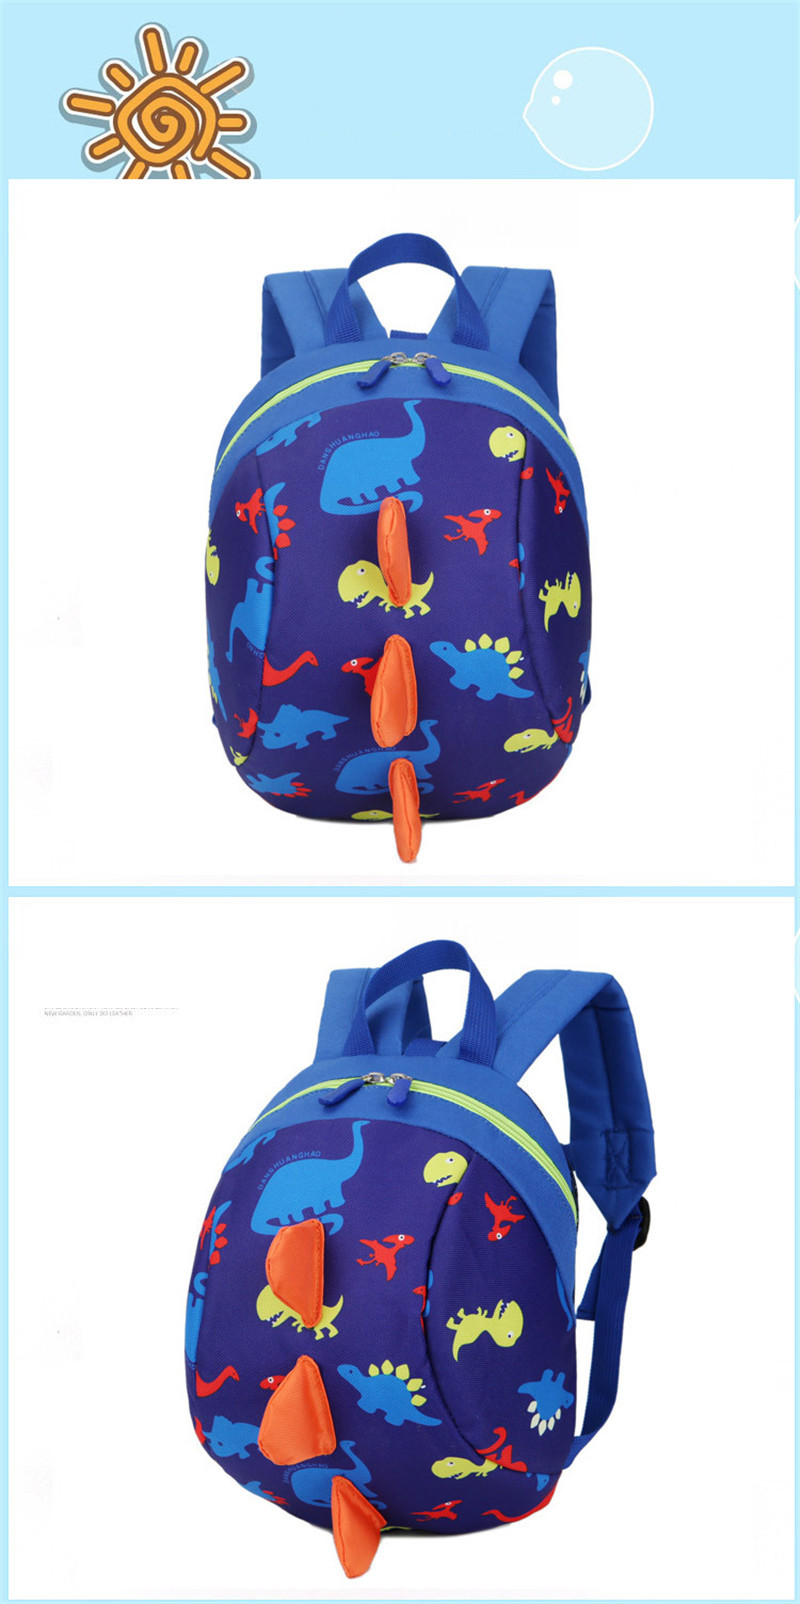 Responsible Customized Kids Baby School Bag Toddler Kindergarten Baby Boy Preschool Satchel Backpack Foot-ball Mochila Children Bookbag Fashionable Style; In